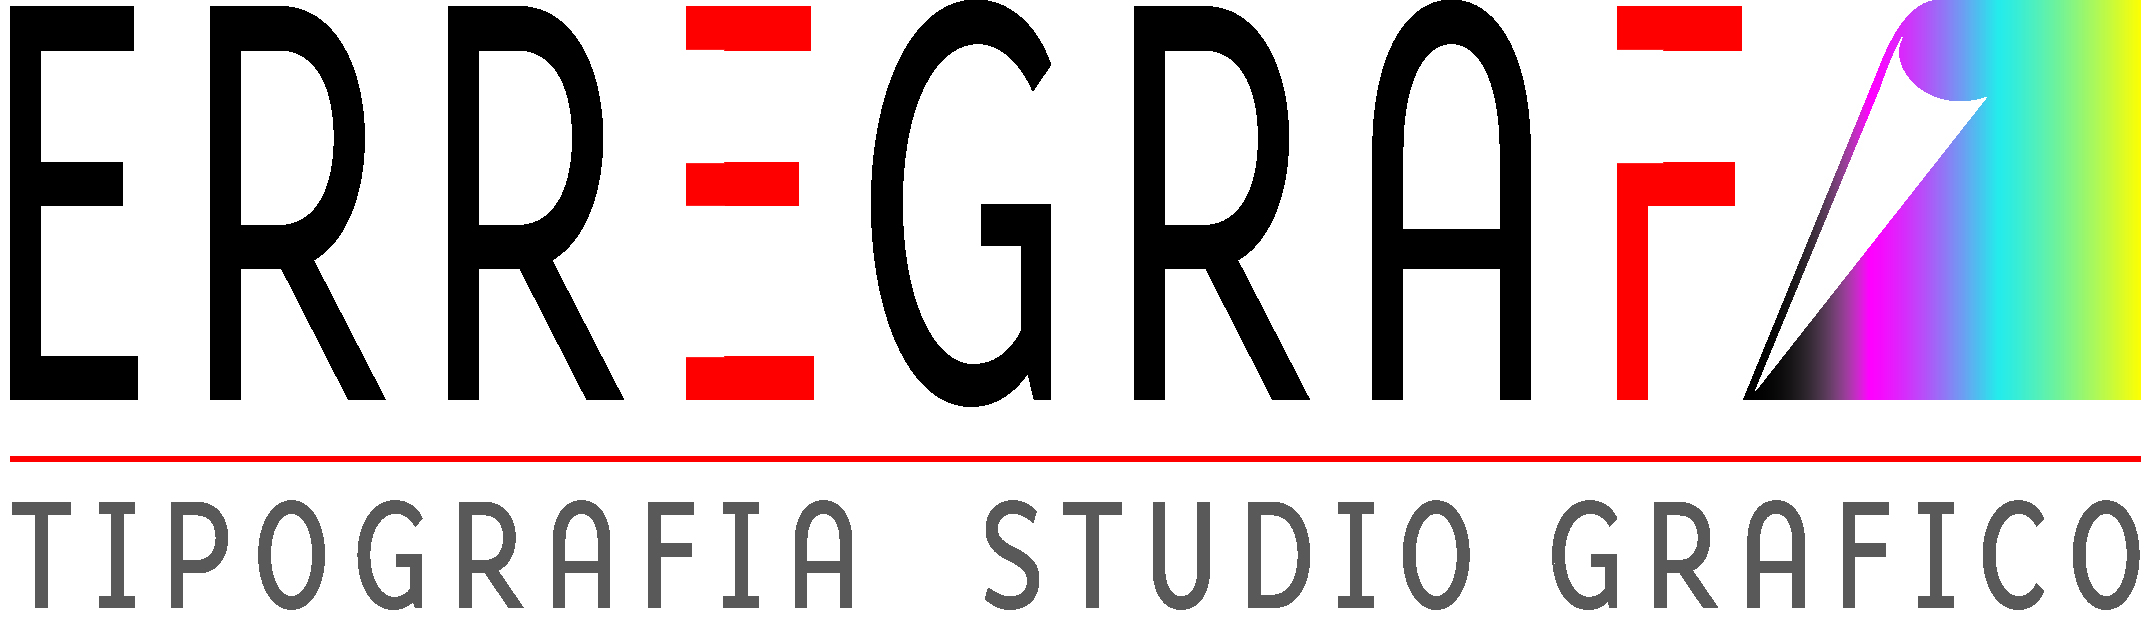 Erregraf SRLS Tipografia Studio Grafico